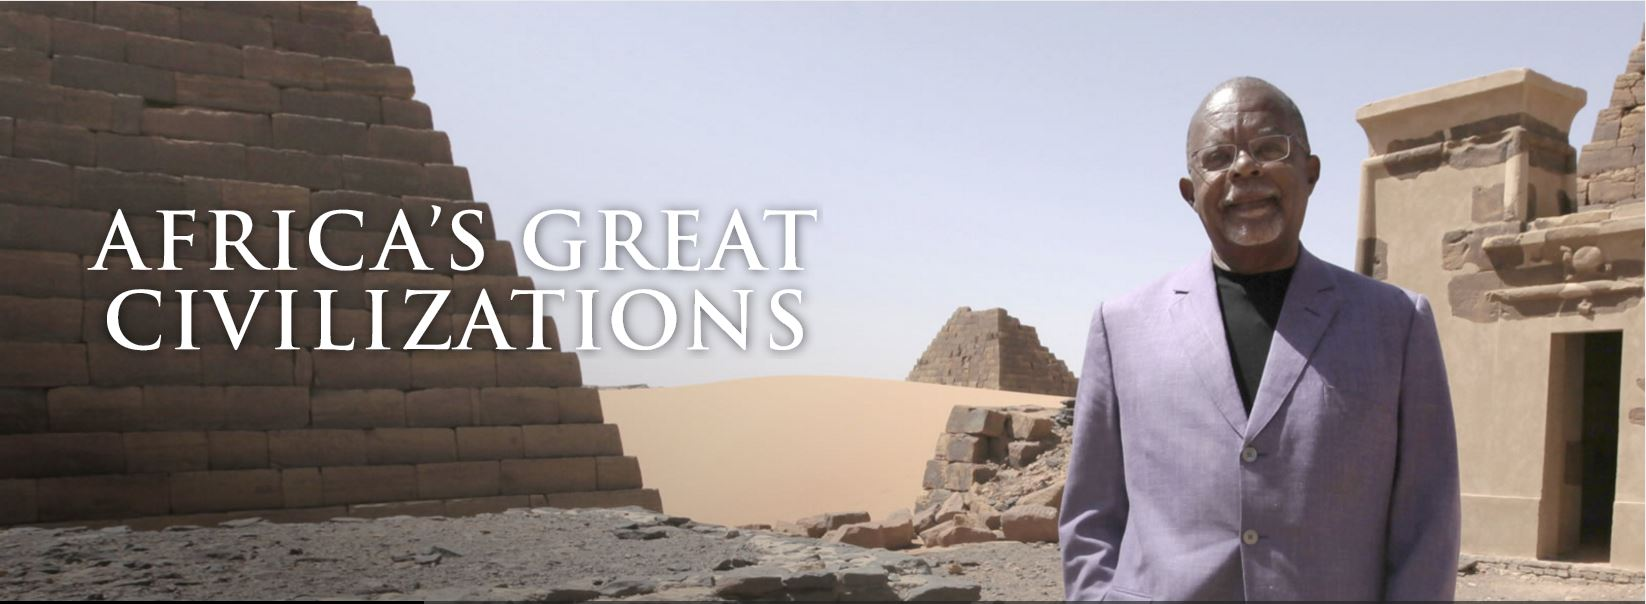 Africas Great Civilizations show snip.JPG